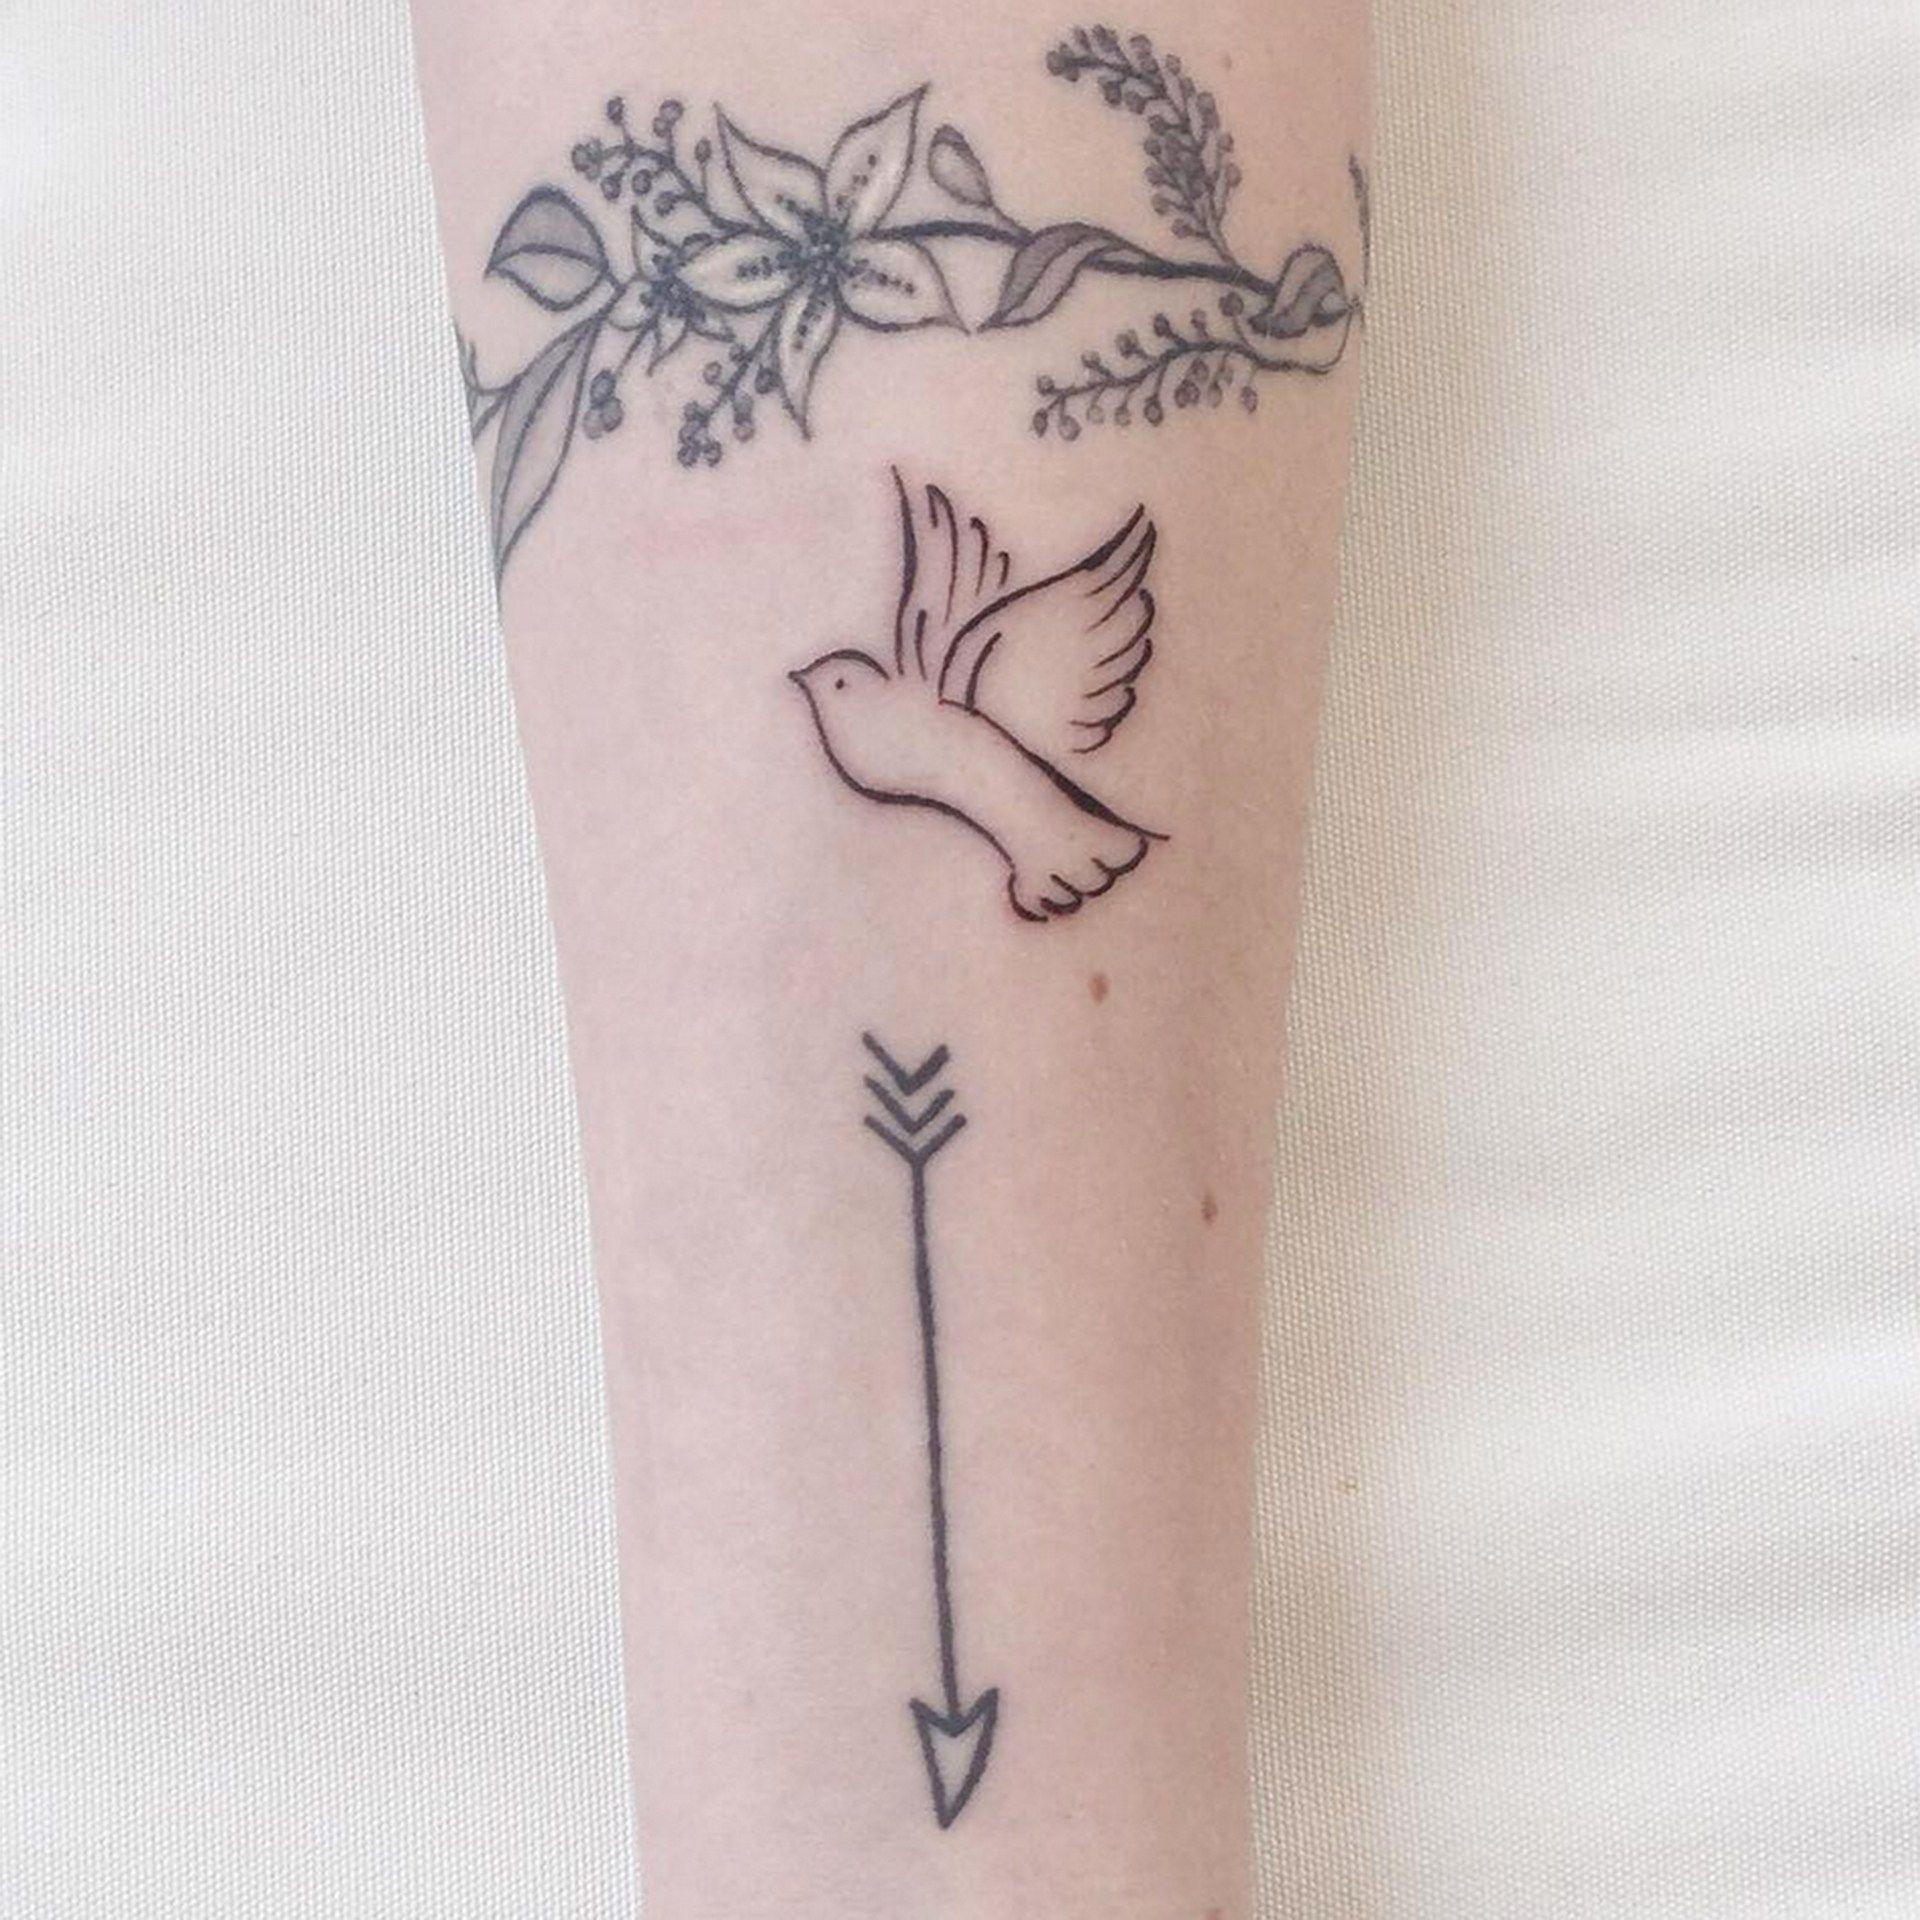 cute tattoo ideas the ultimate instagram inkspiration tattoo